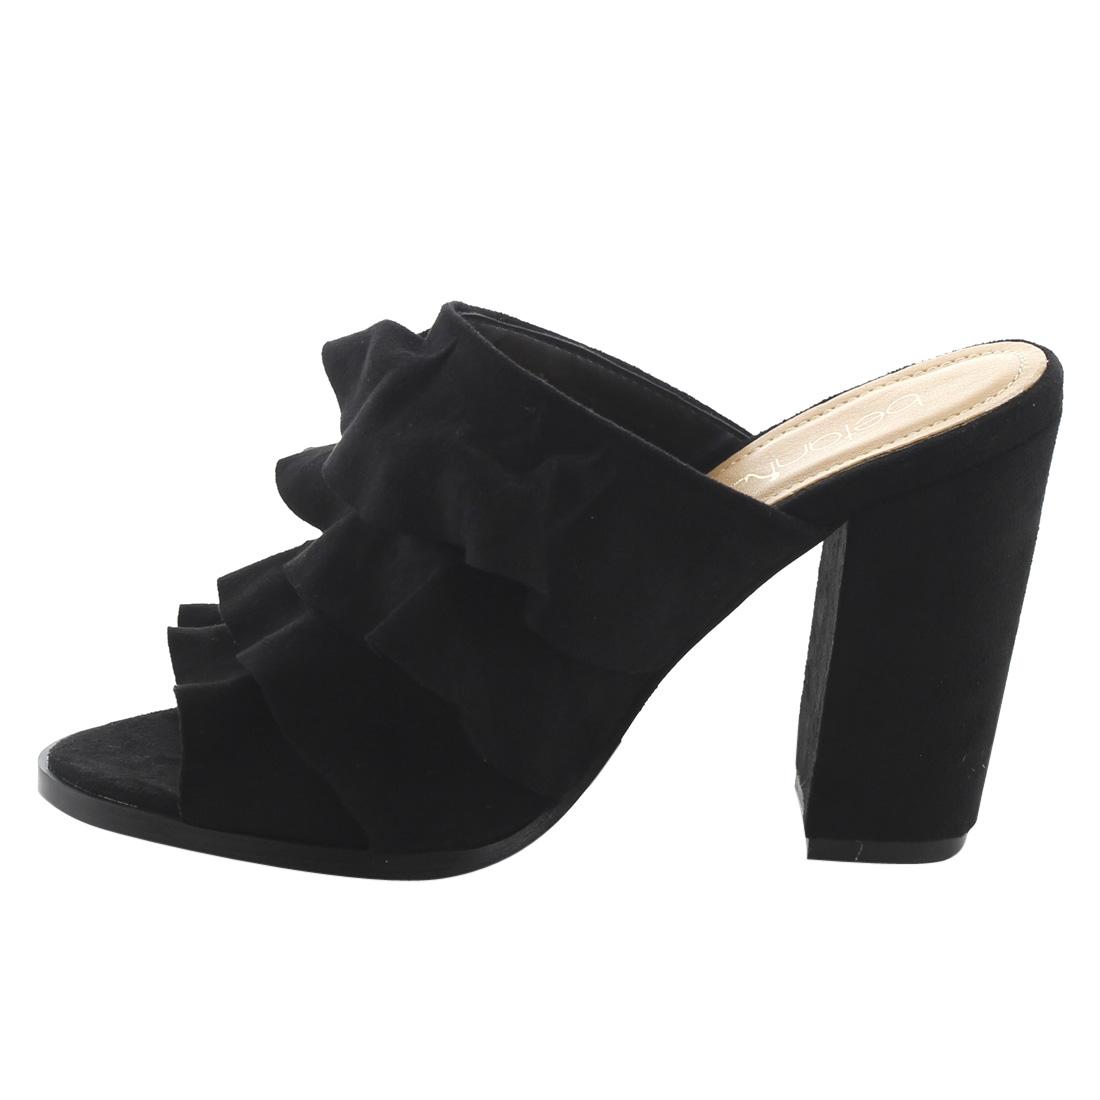 0a8b2ebe76 BETANI - BETANI FK51 Women s Peep Toe Ruffles Slip On Block Heel Mule  Sandals - Walmart.com